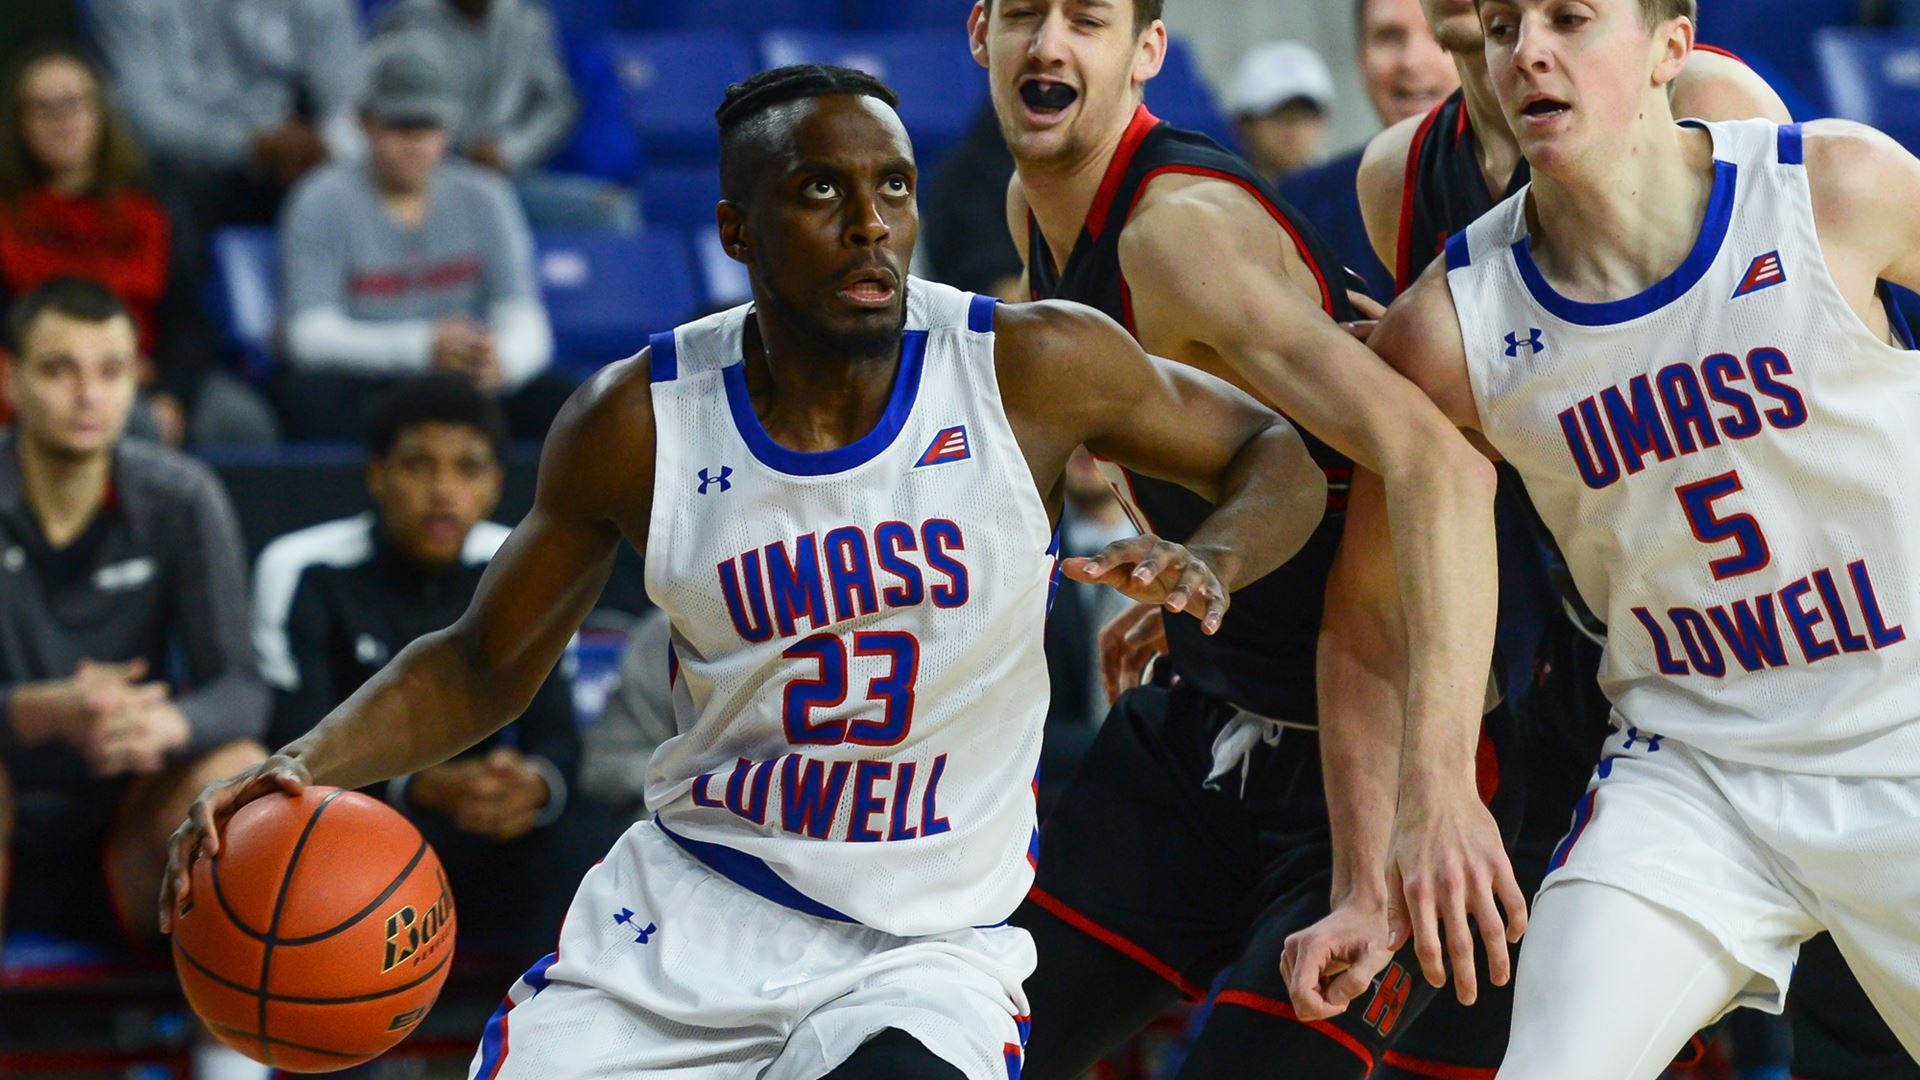 Hartford defeats UMass Lowell